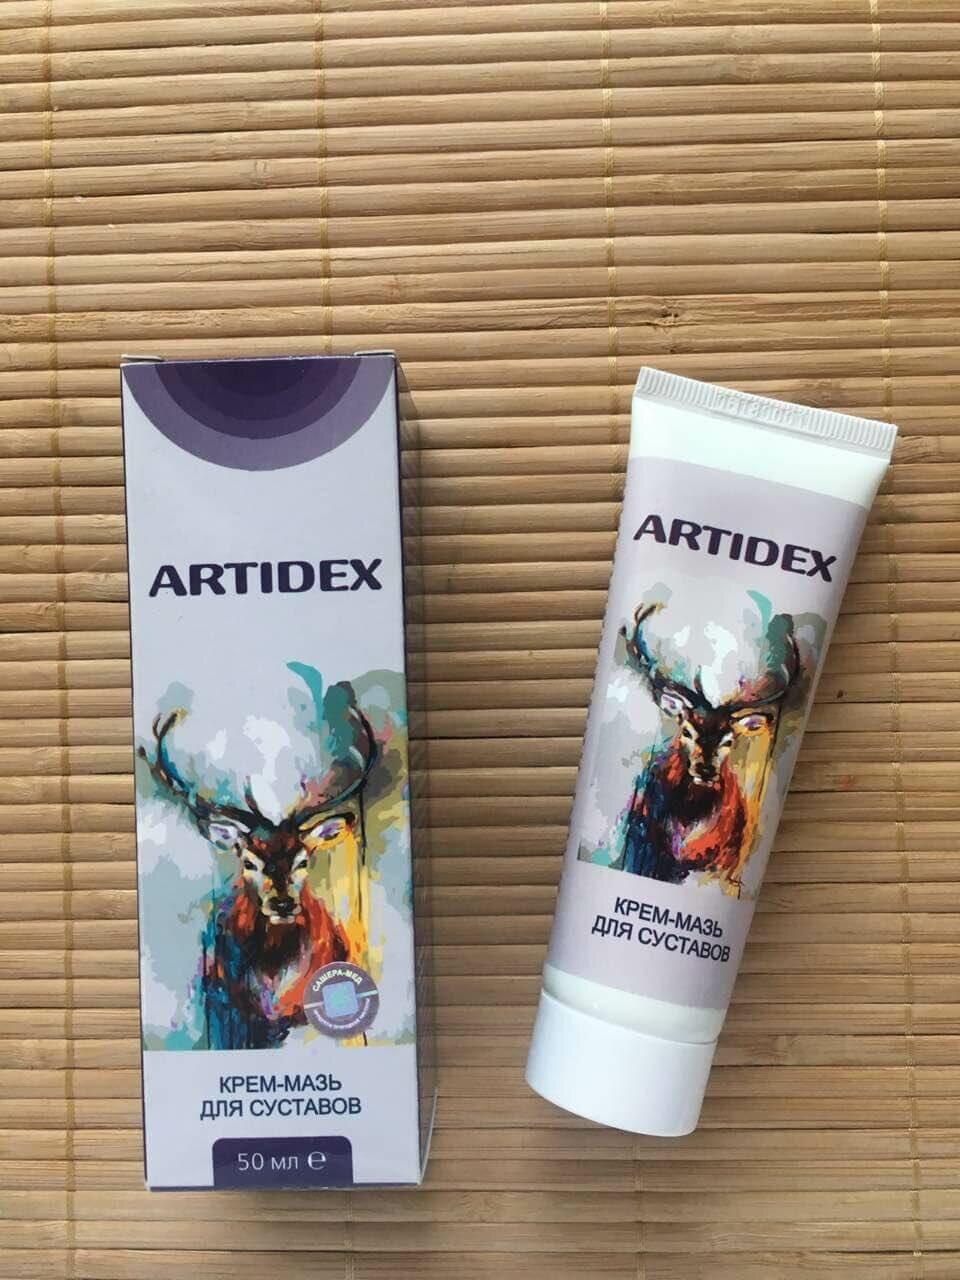 Artidex - крем-мазь для суставов в Завитинске